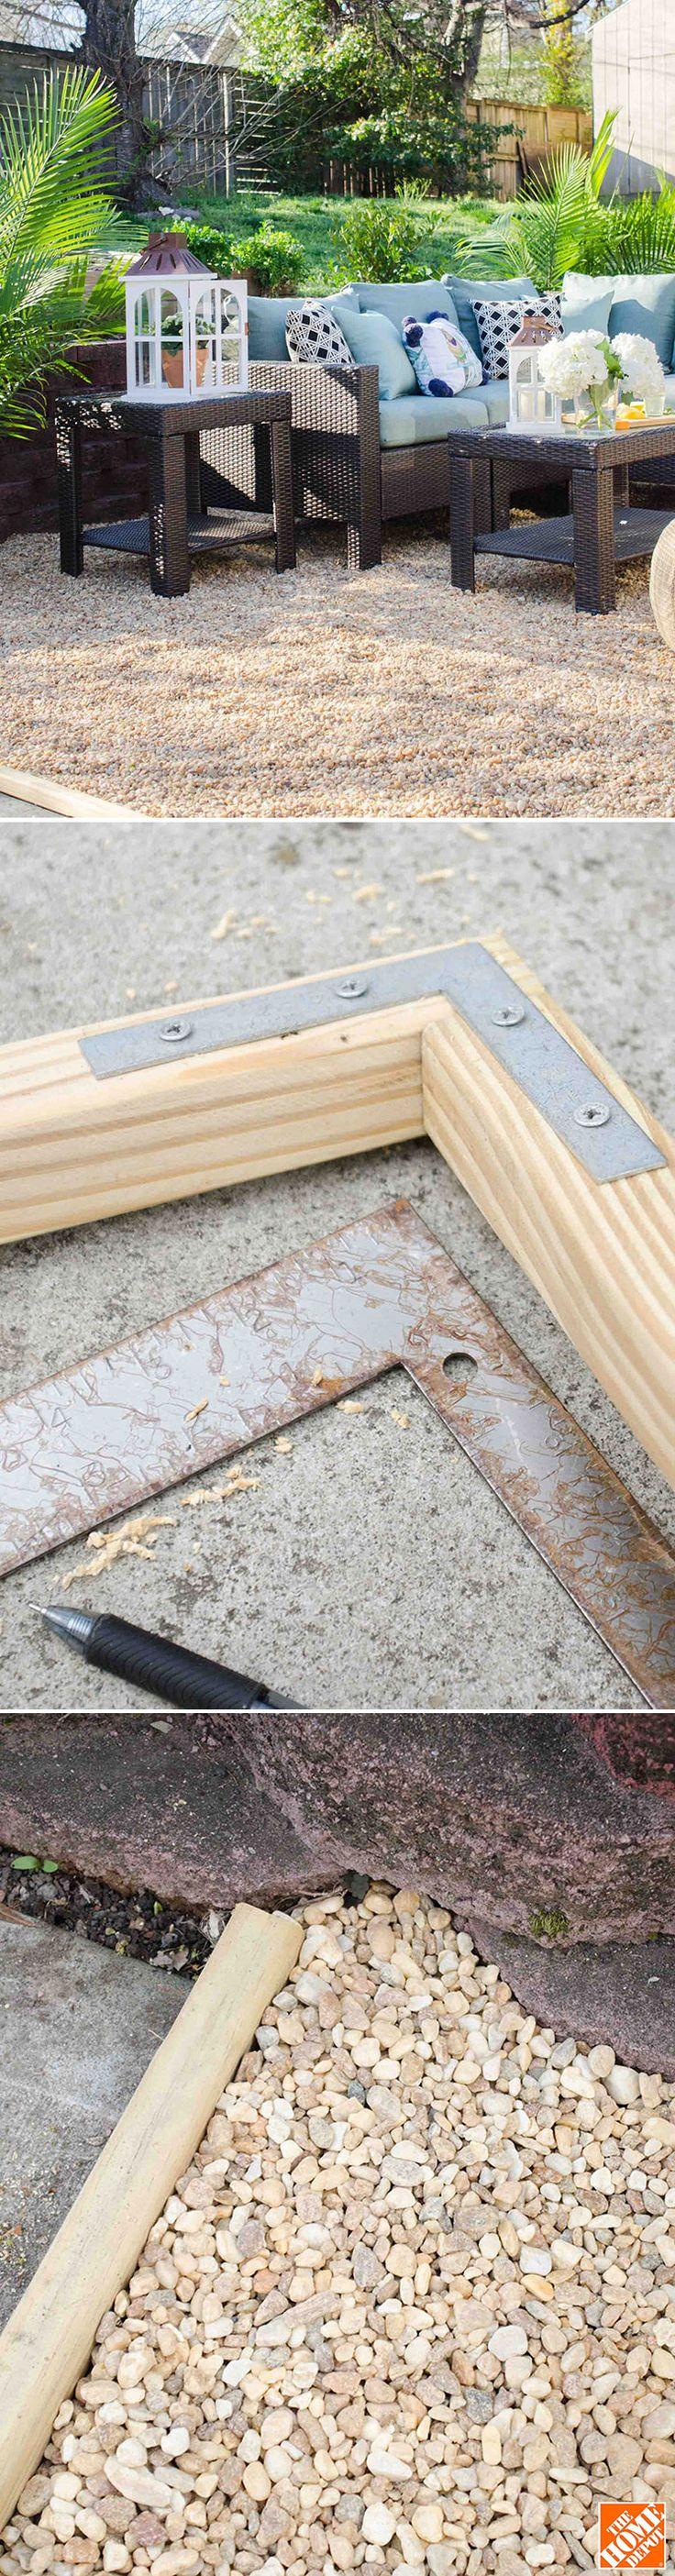 Home Depot Patio Slabs : Best ideas about concrete slab on pinterest diy